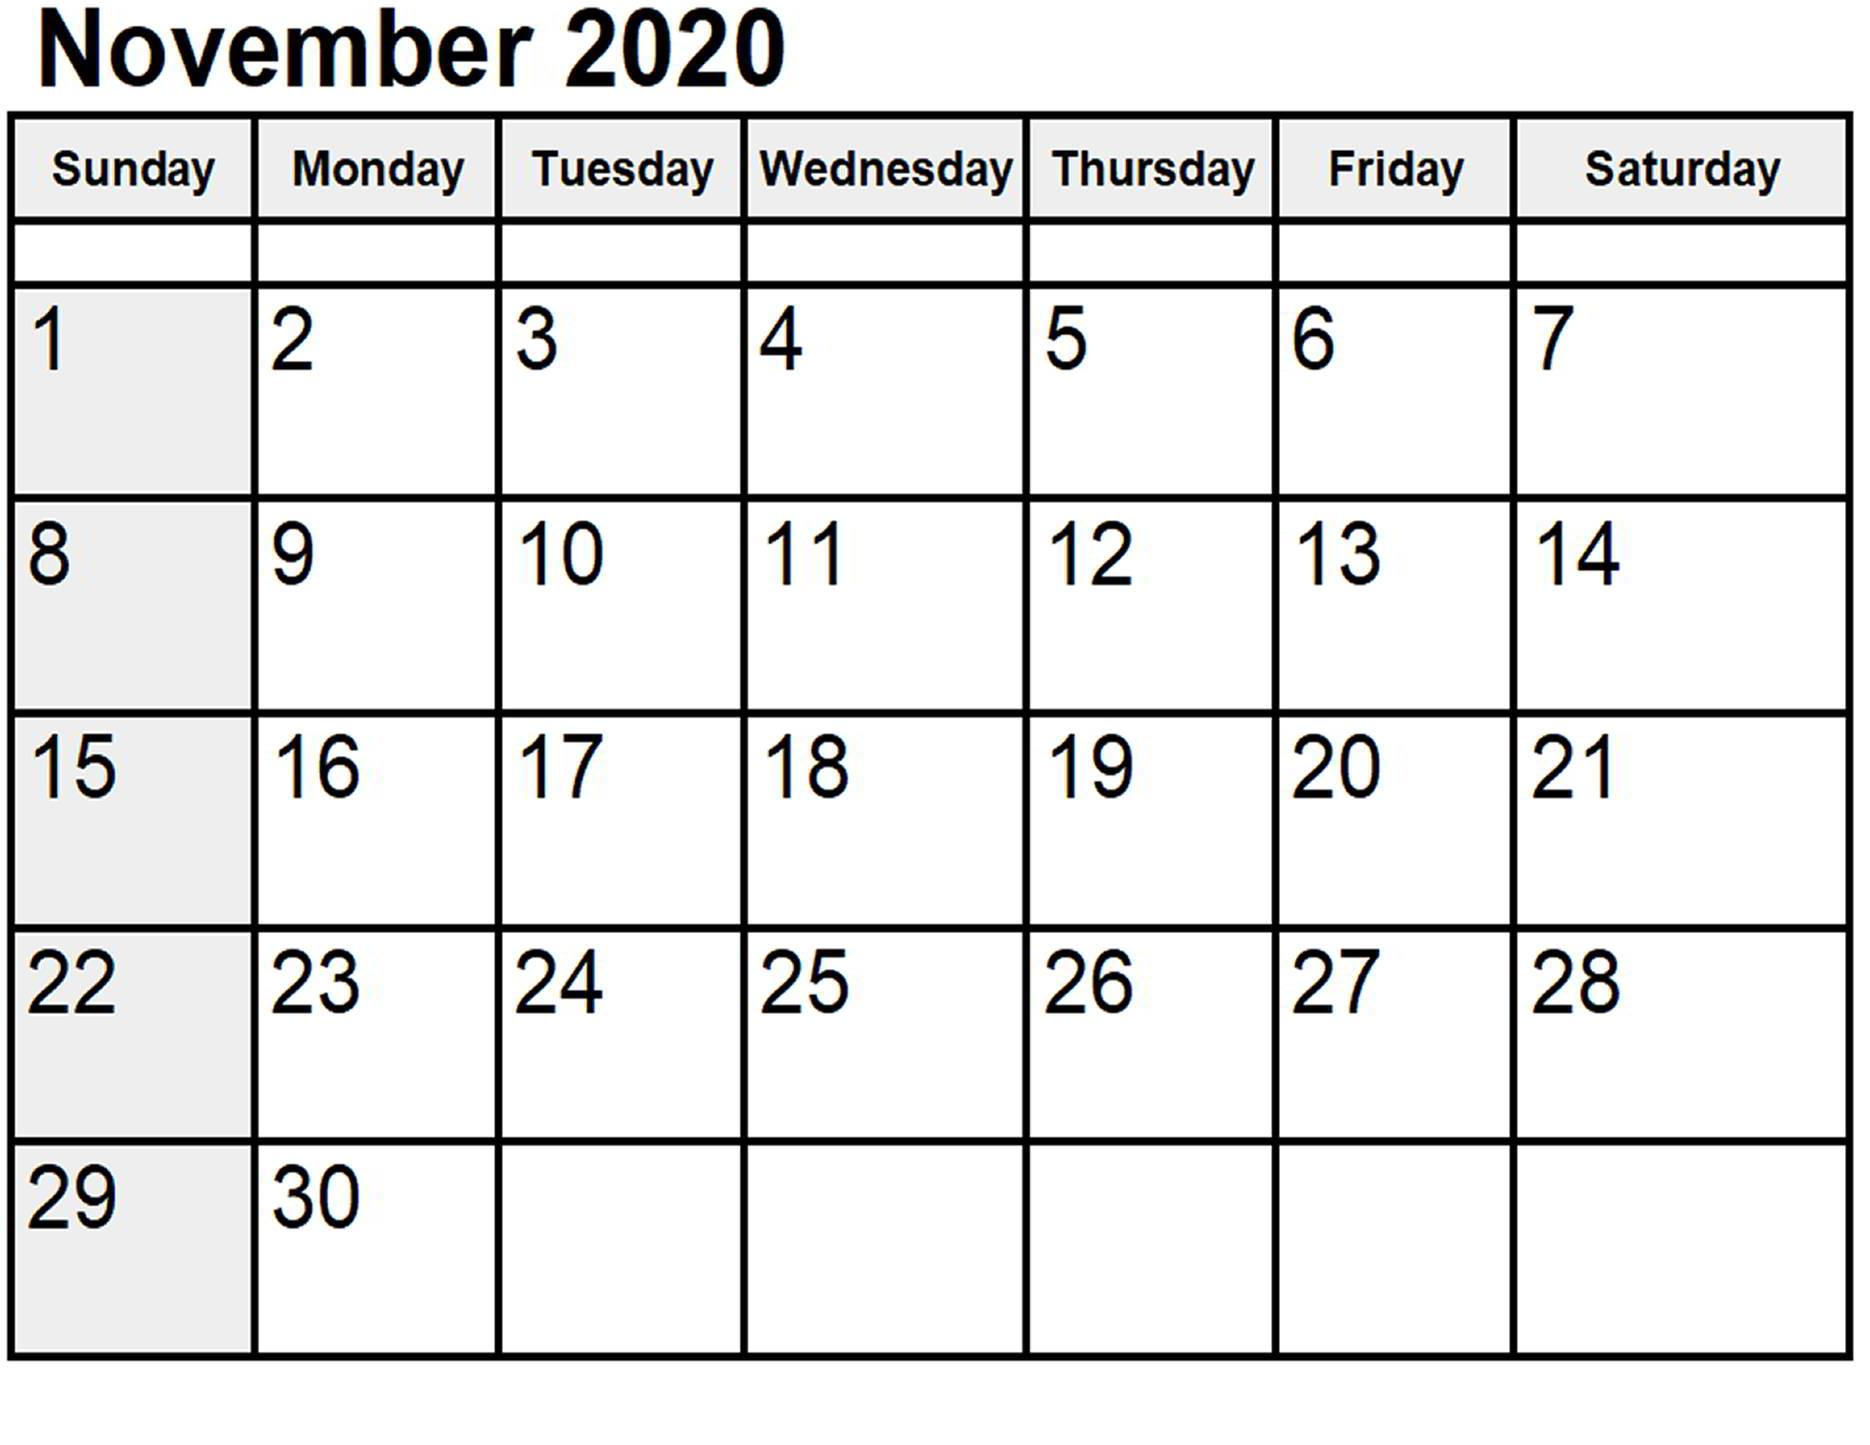 November 2020 Monthly Calendar Free